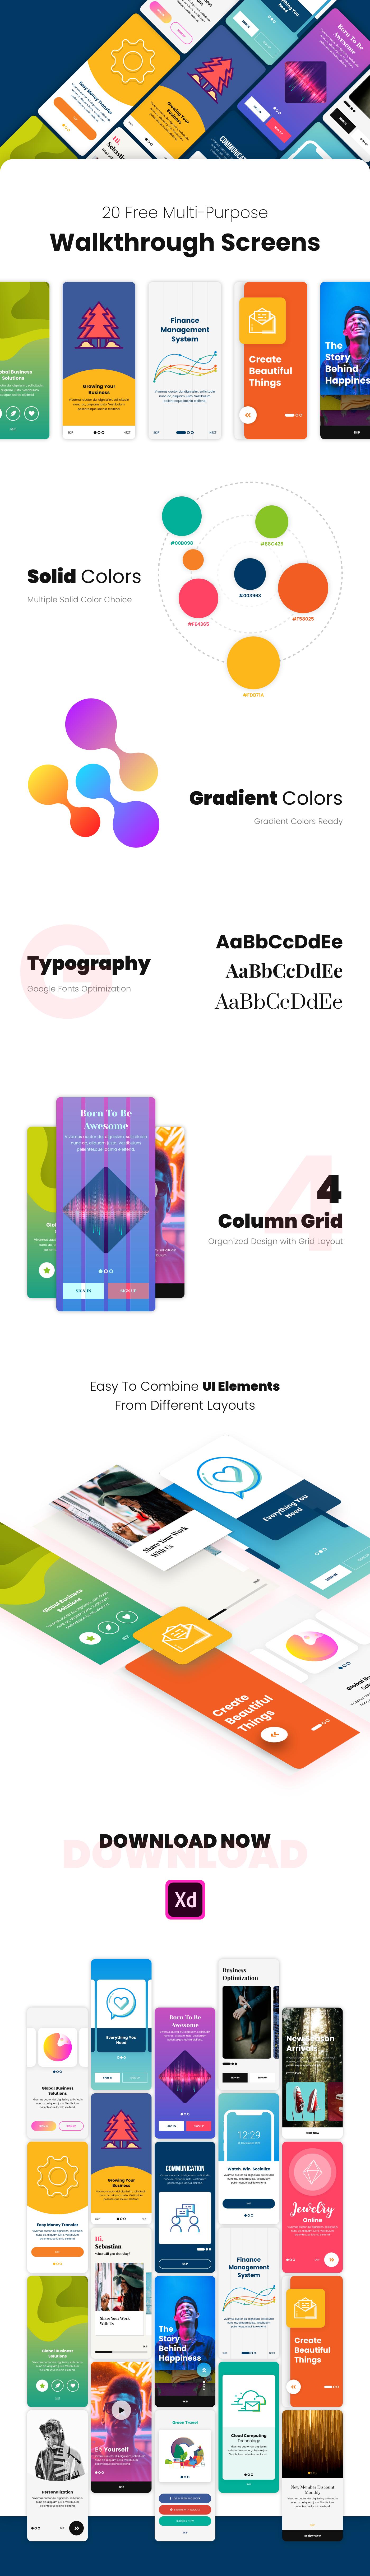 mobile walkthrough welcome UI ux Multipurpose free download app MadeWithAdobeXd